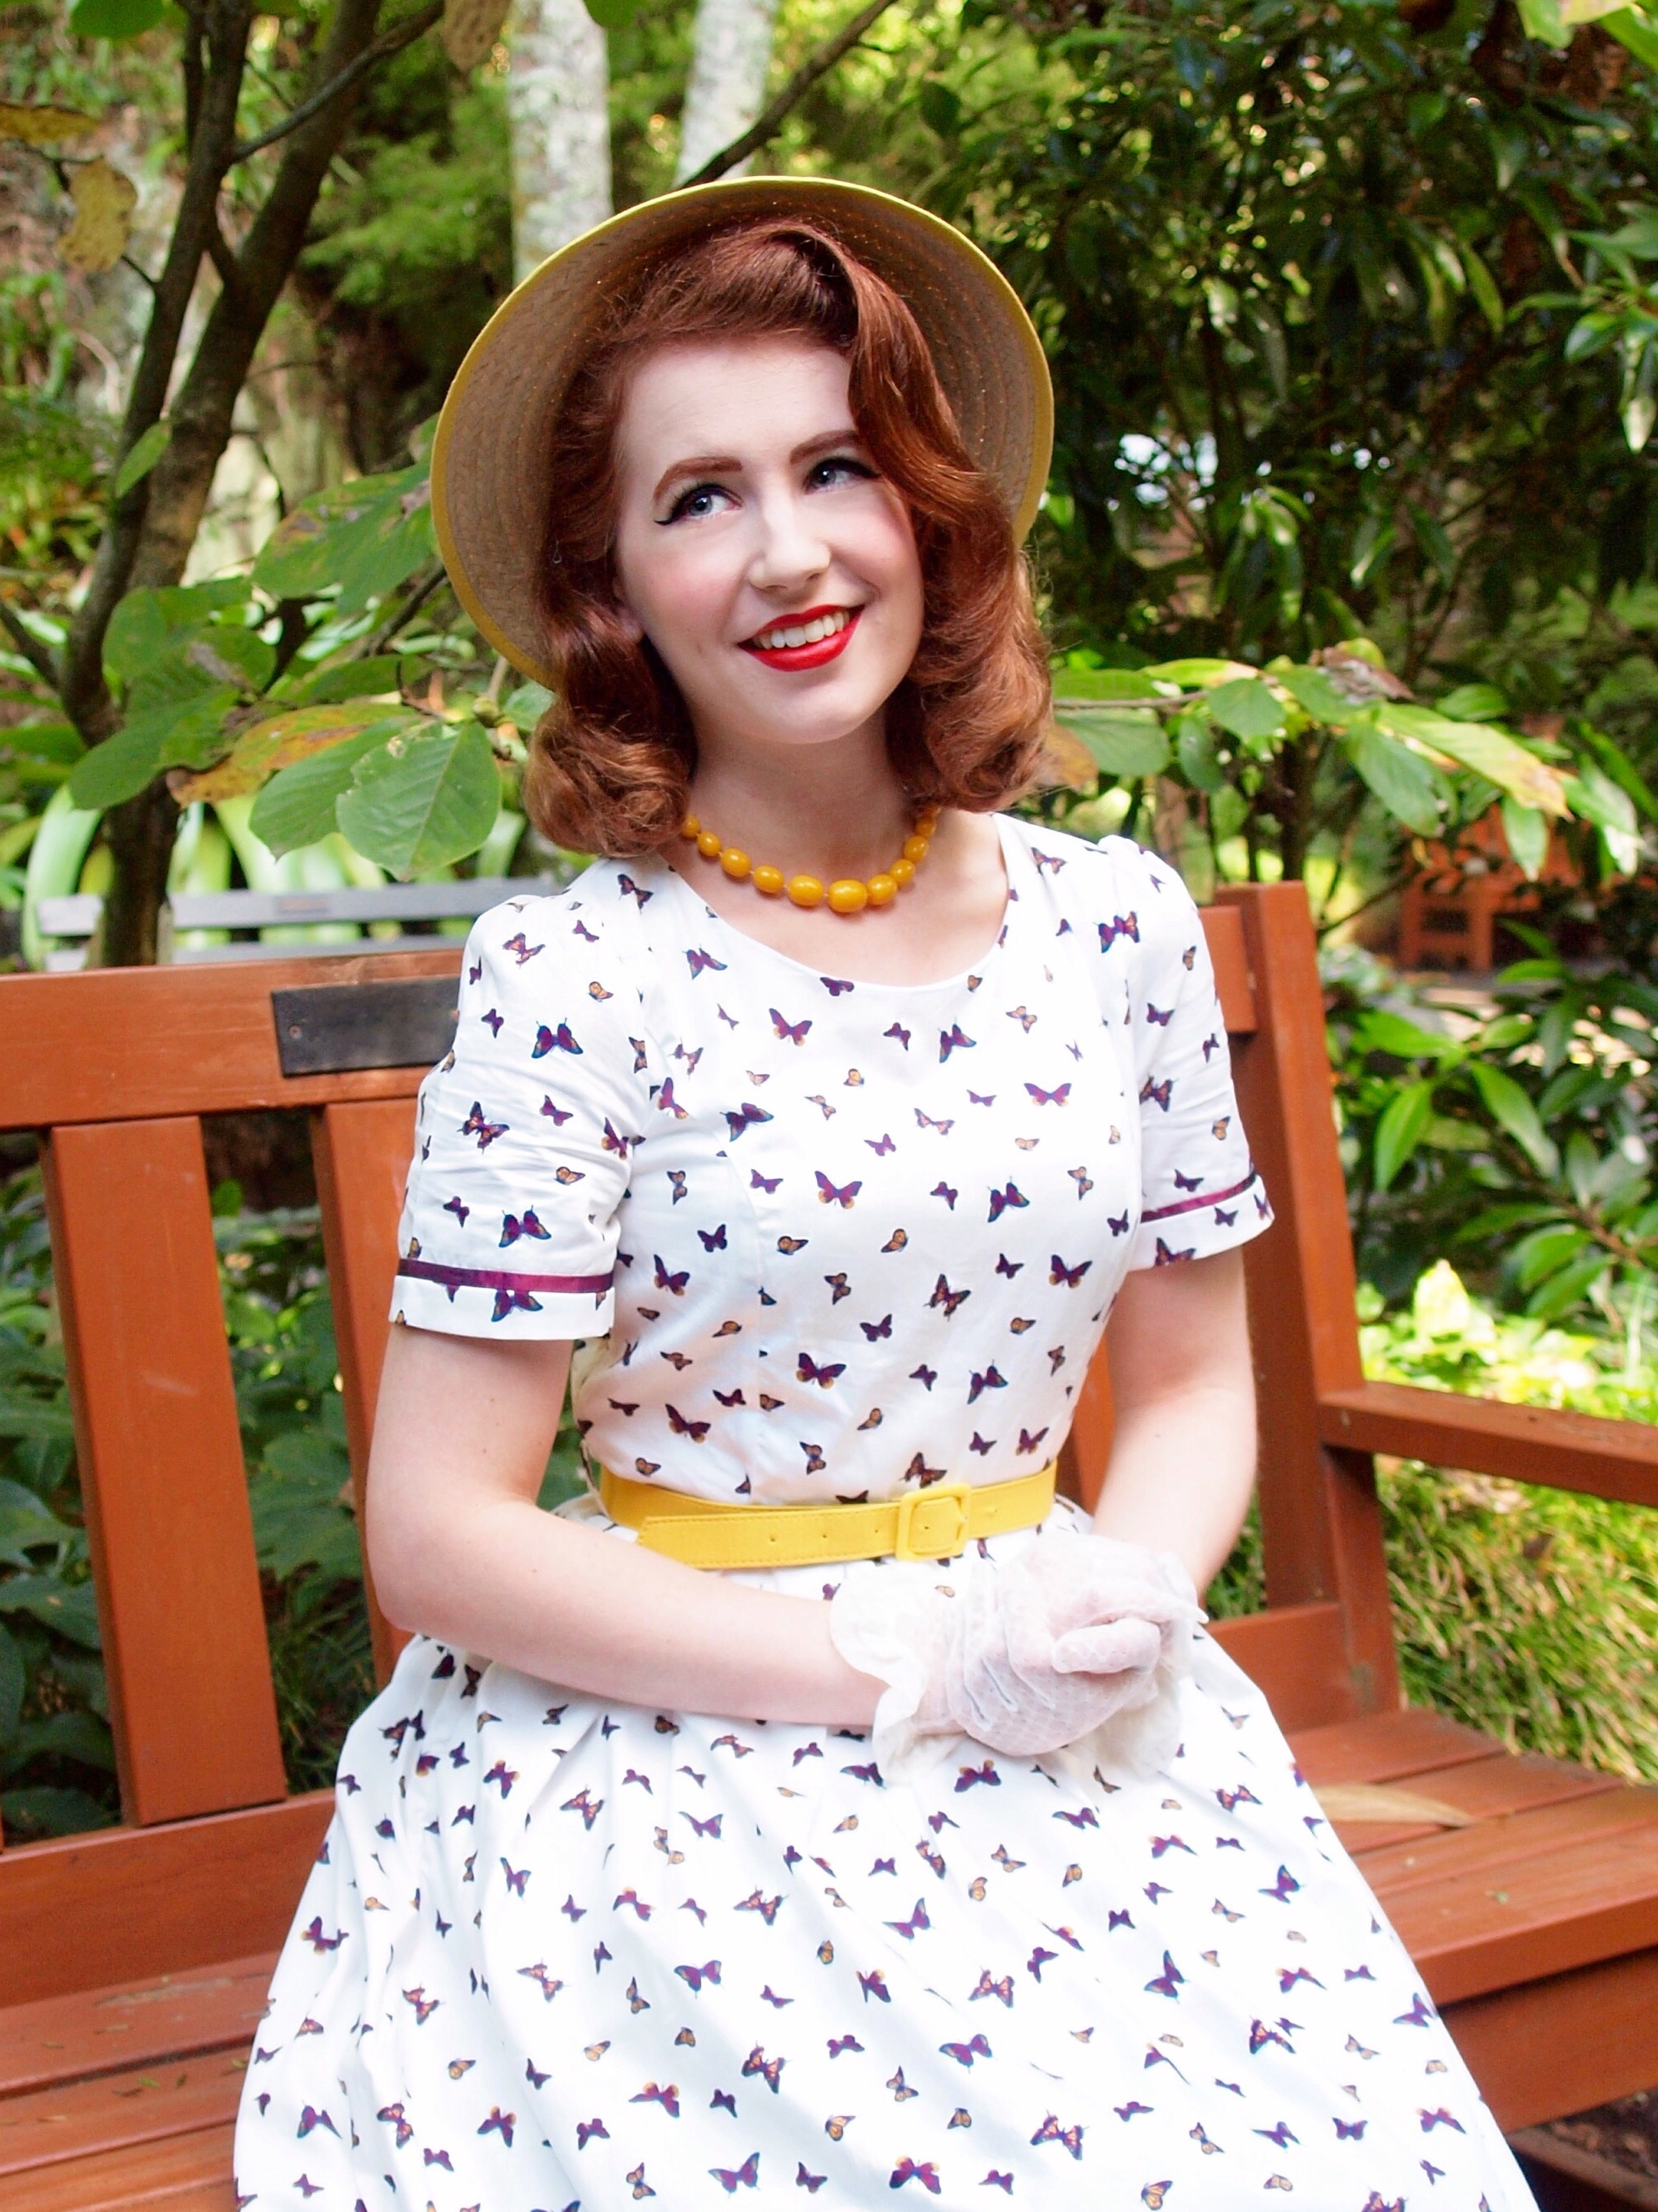 bcab62cda Review: Dressific Butterfly dress – Miss Hero Holliday